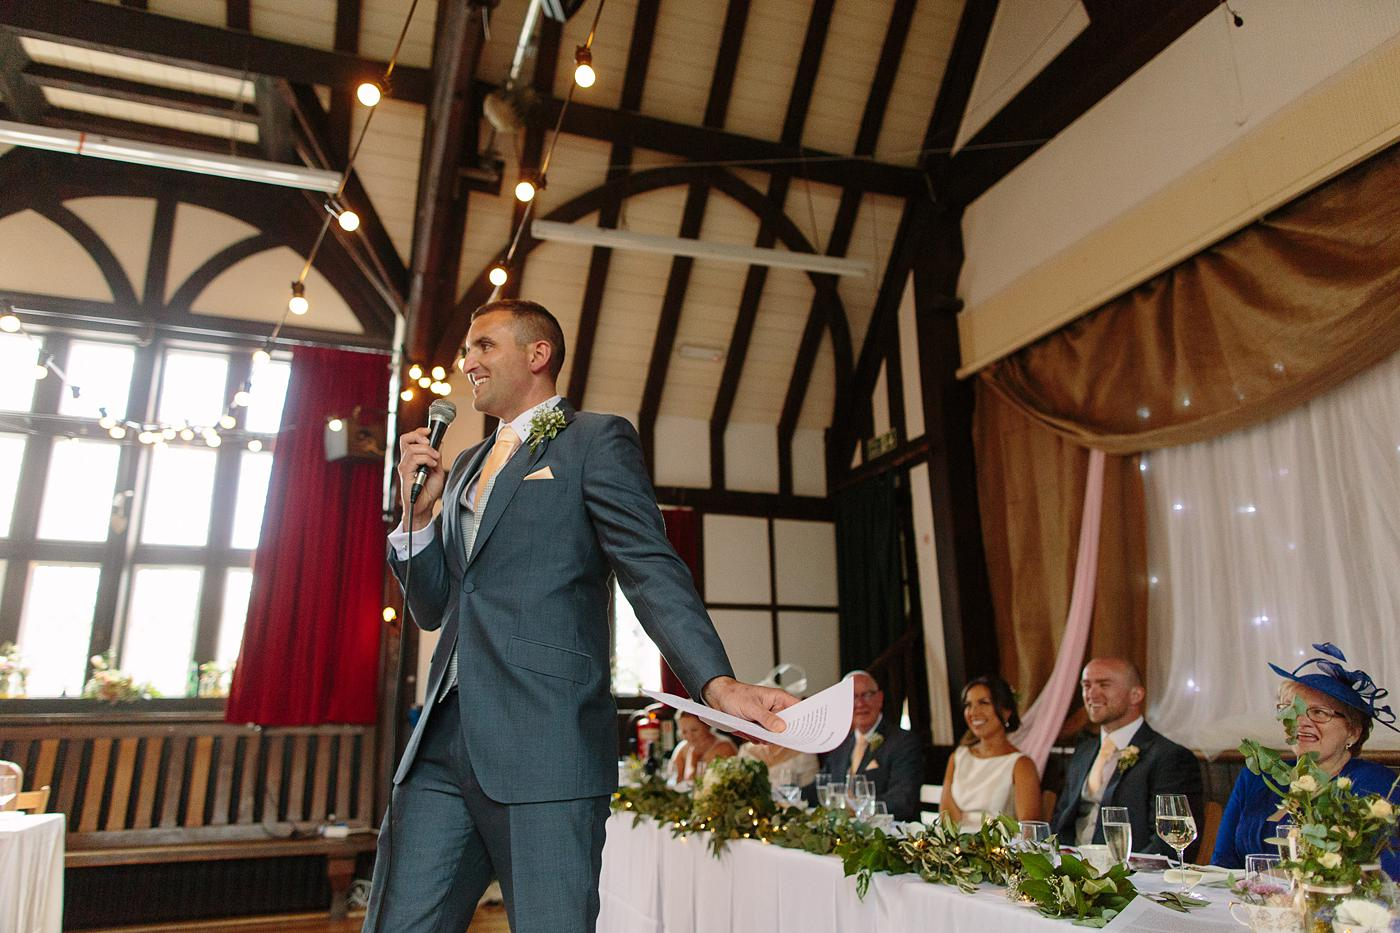 Winstanstow wedding photography 0891